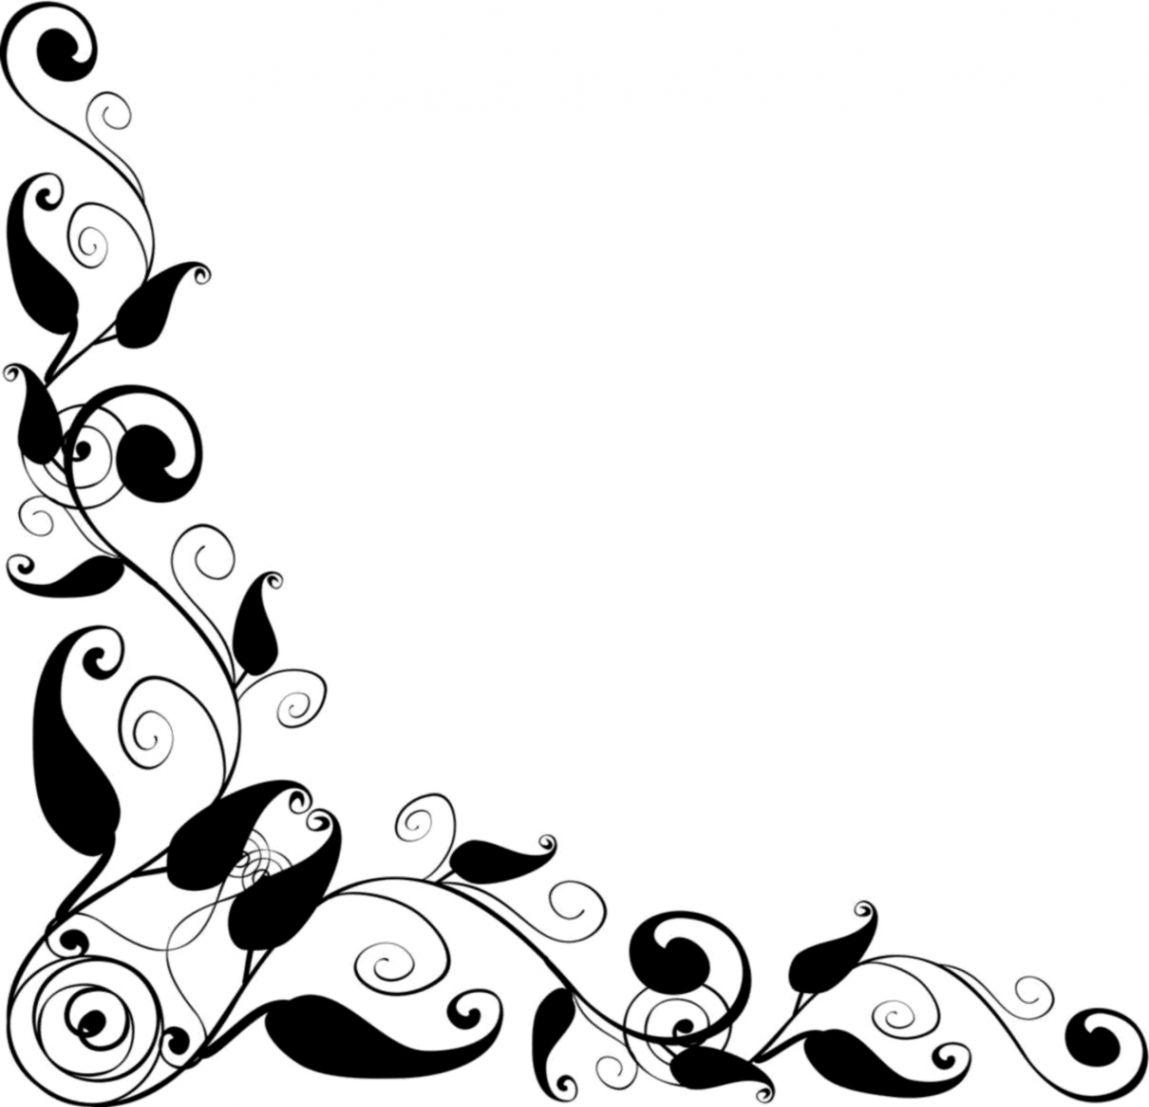 Gambar Abstrak Bunga Background Bunga Hitam Putih Blog Floral Design 1149x1107 Wallpaper Teahub Io